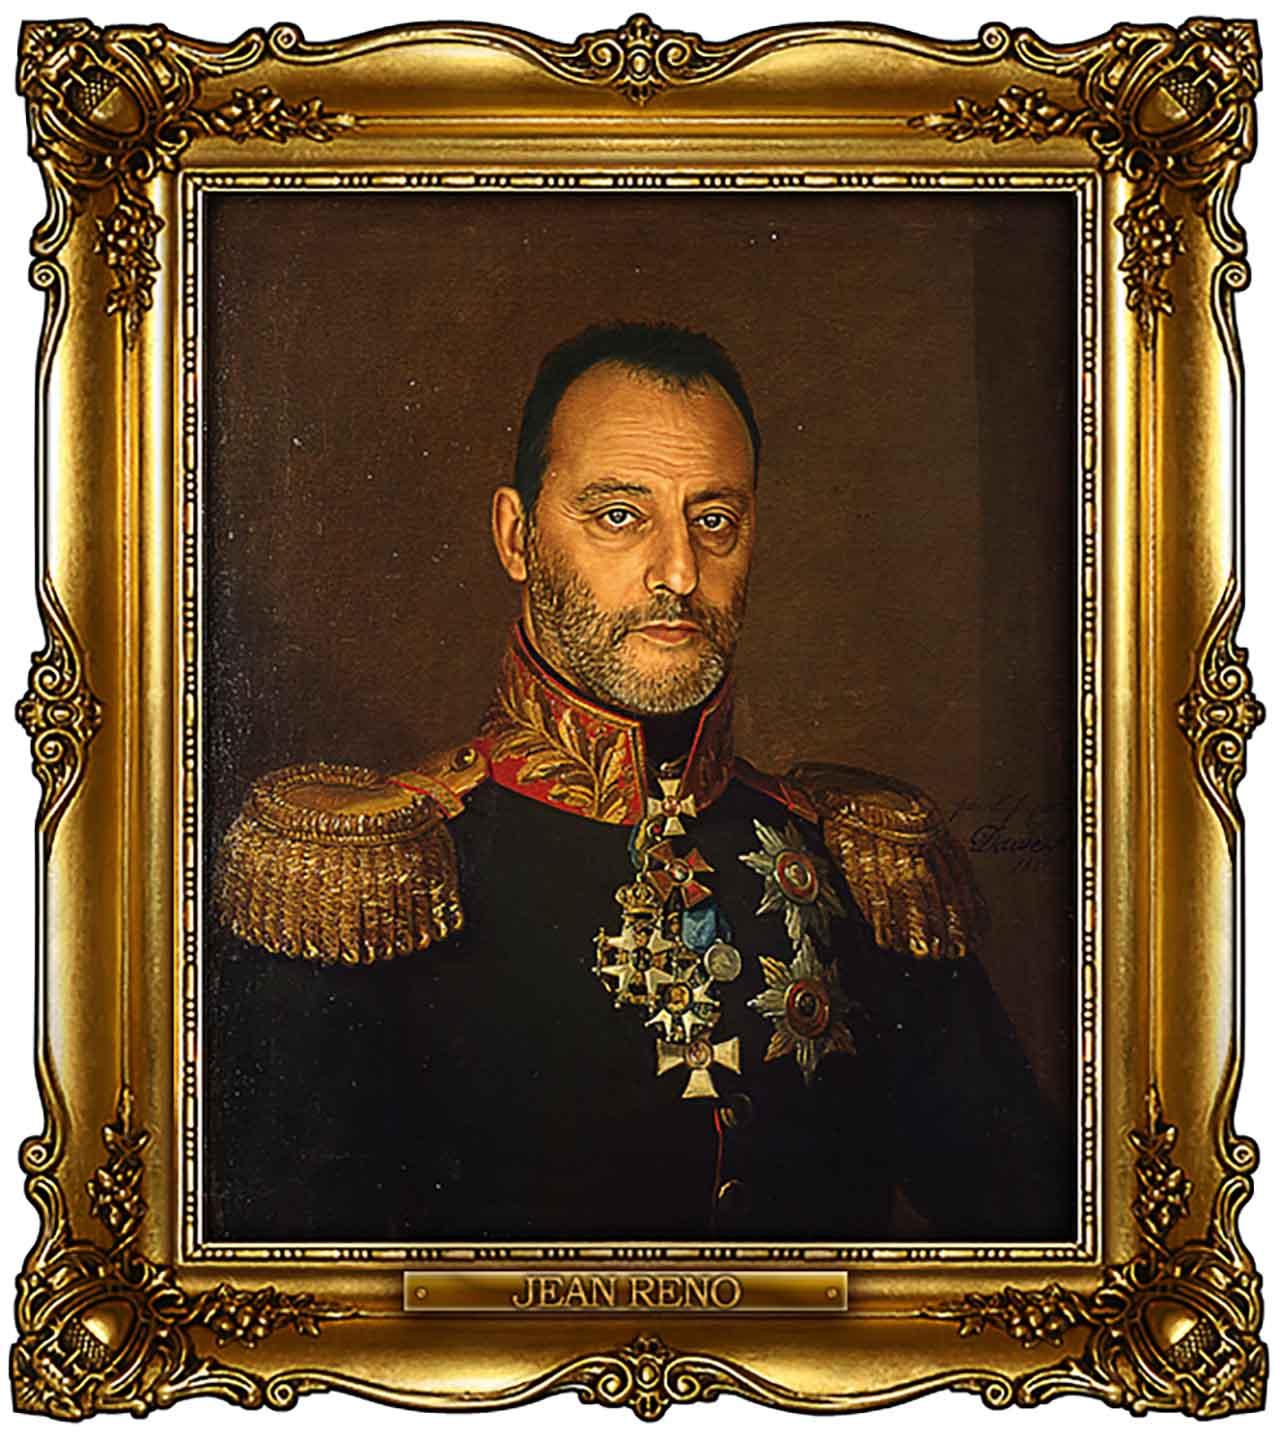 Artist Turns Famous Actors Into Russian Generals - Jean Reno